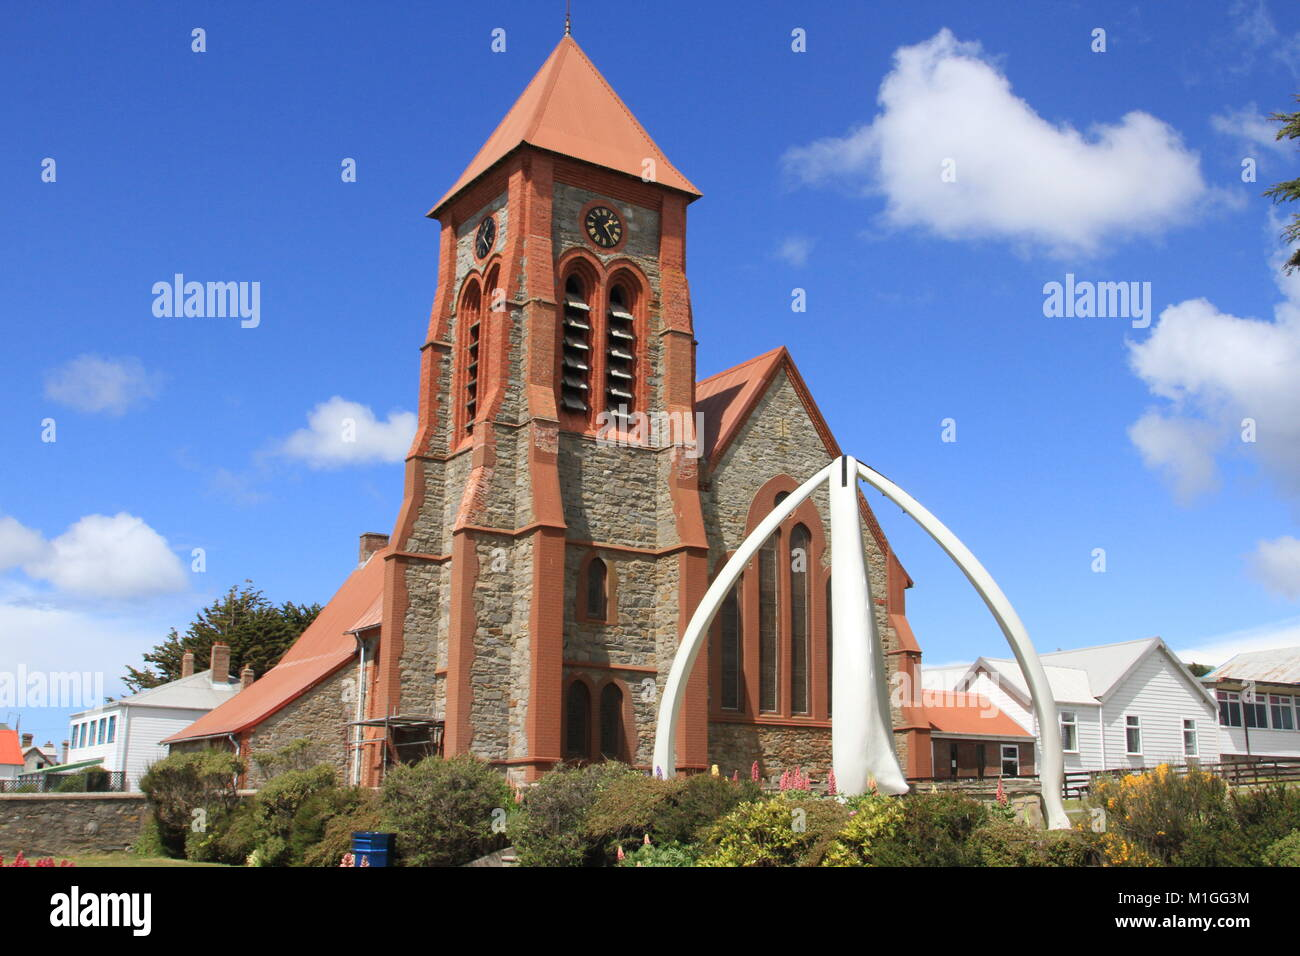 Falkland Islands - Stock Image